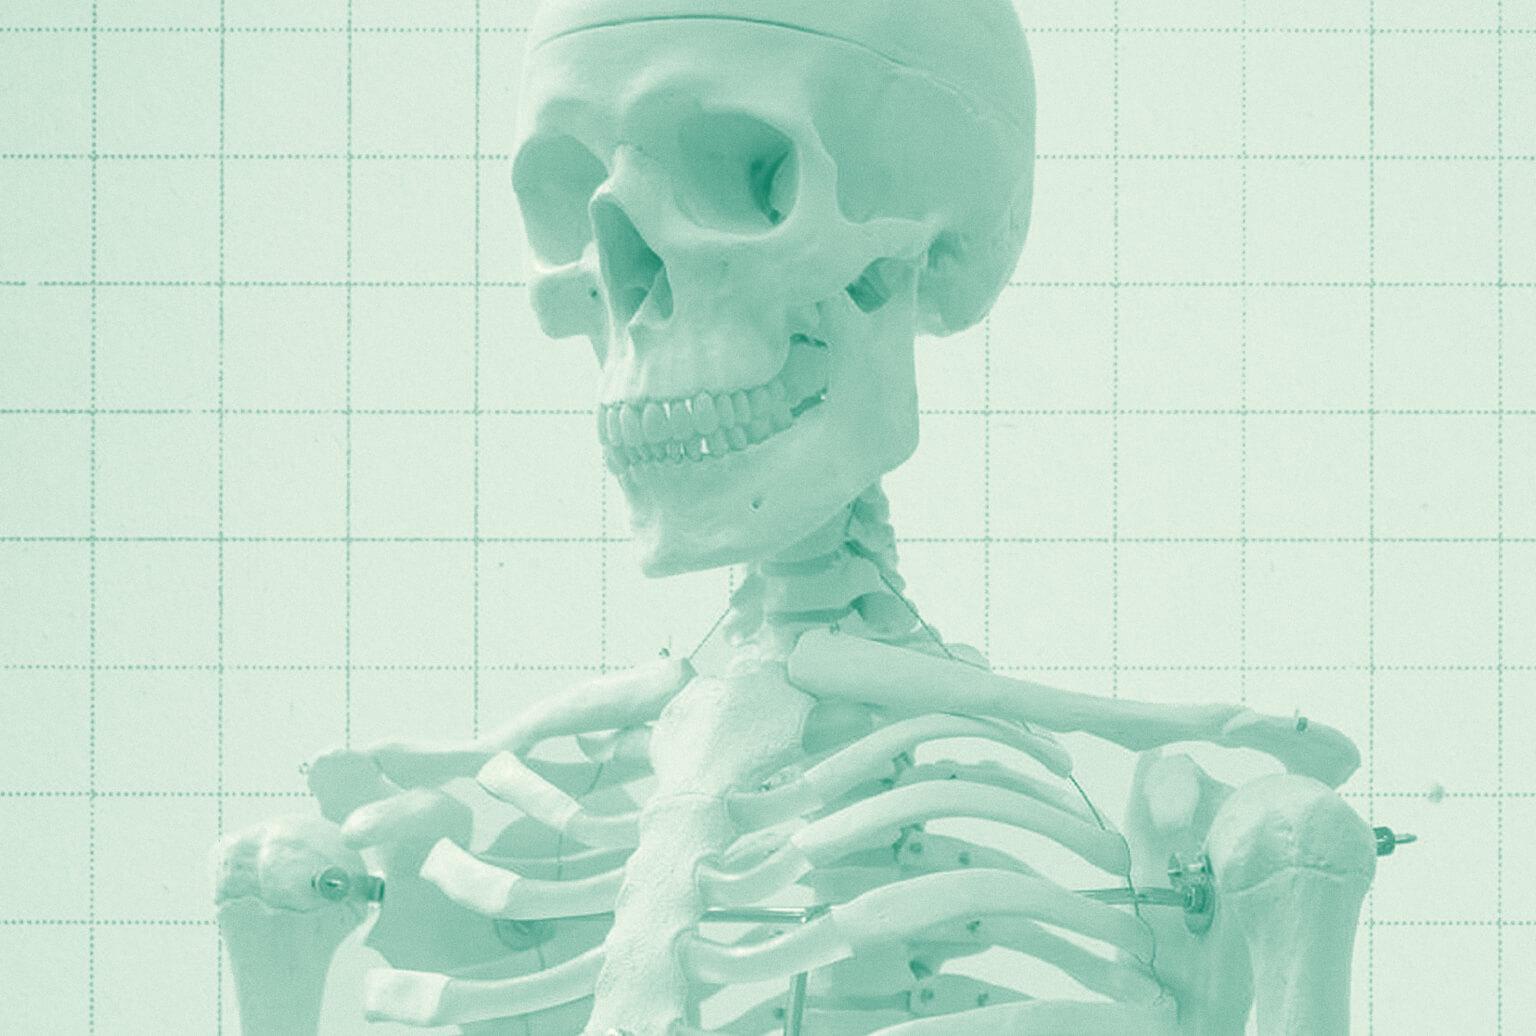 Upper torso and head of a skeleton model.